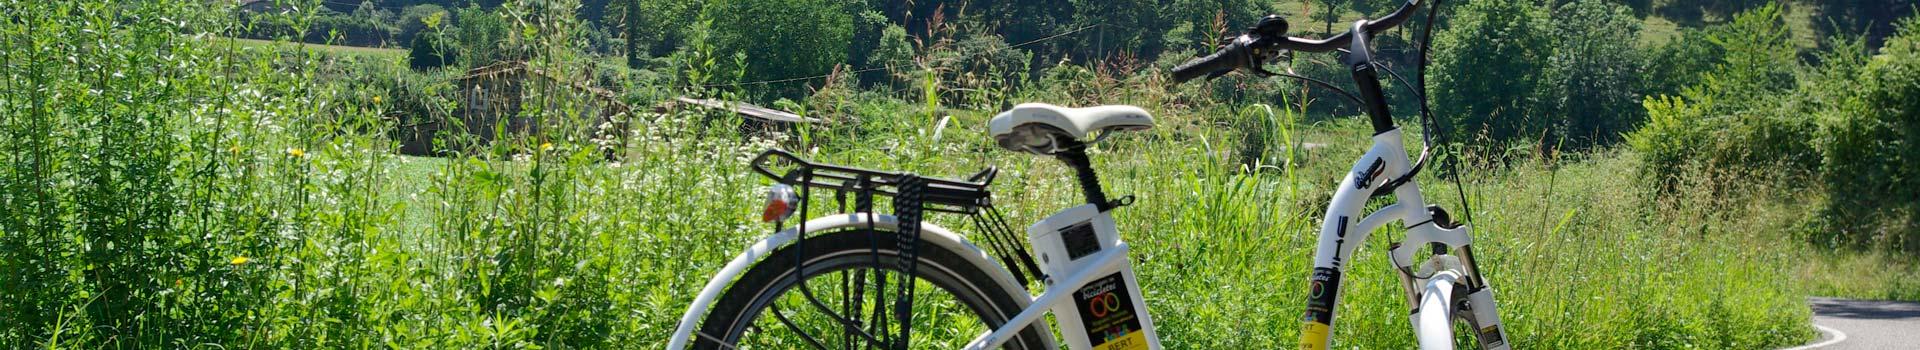 lloguer-bicicletes-electriques